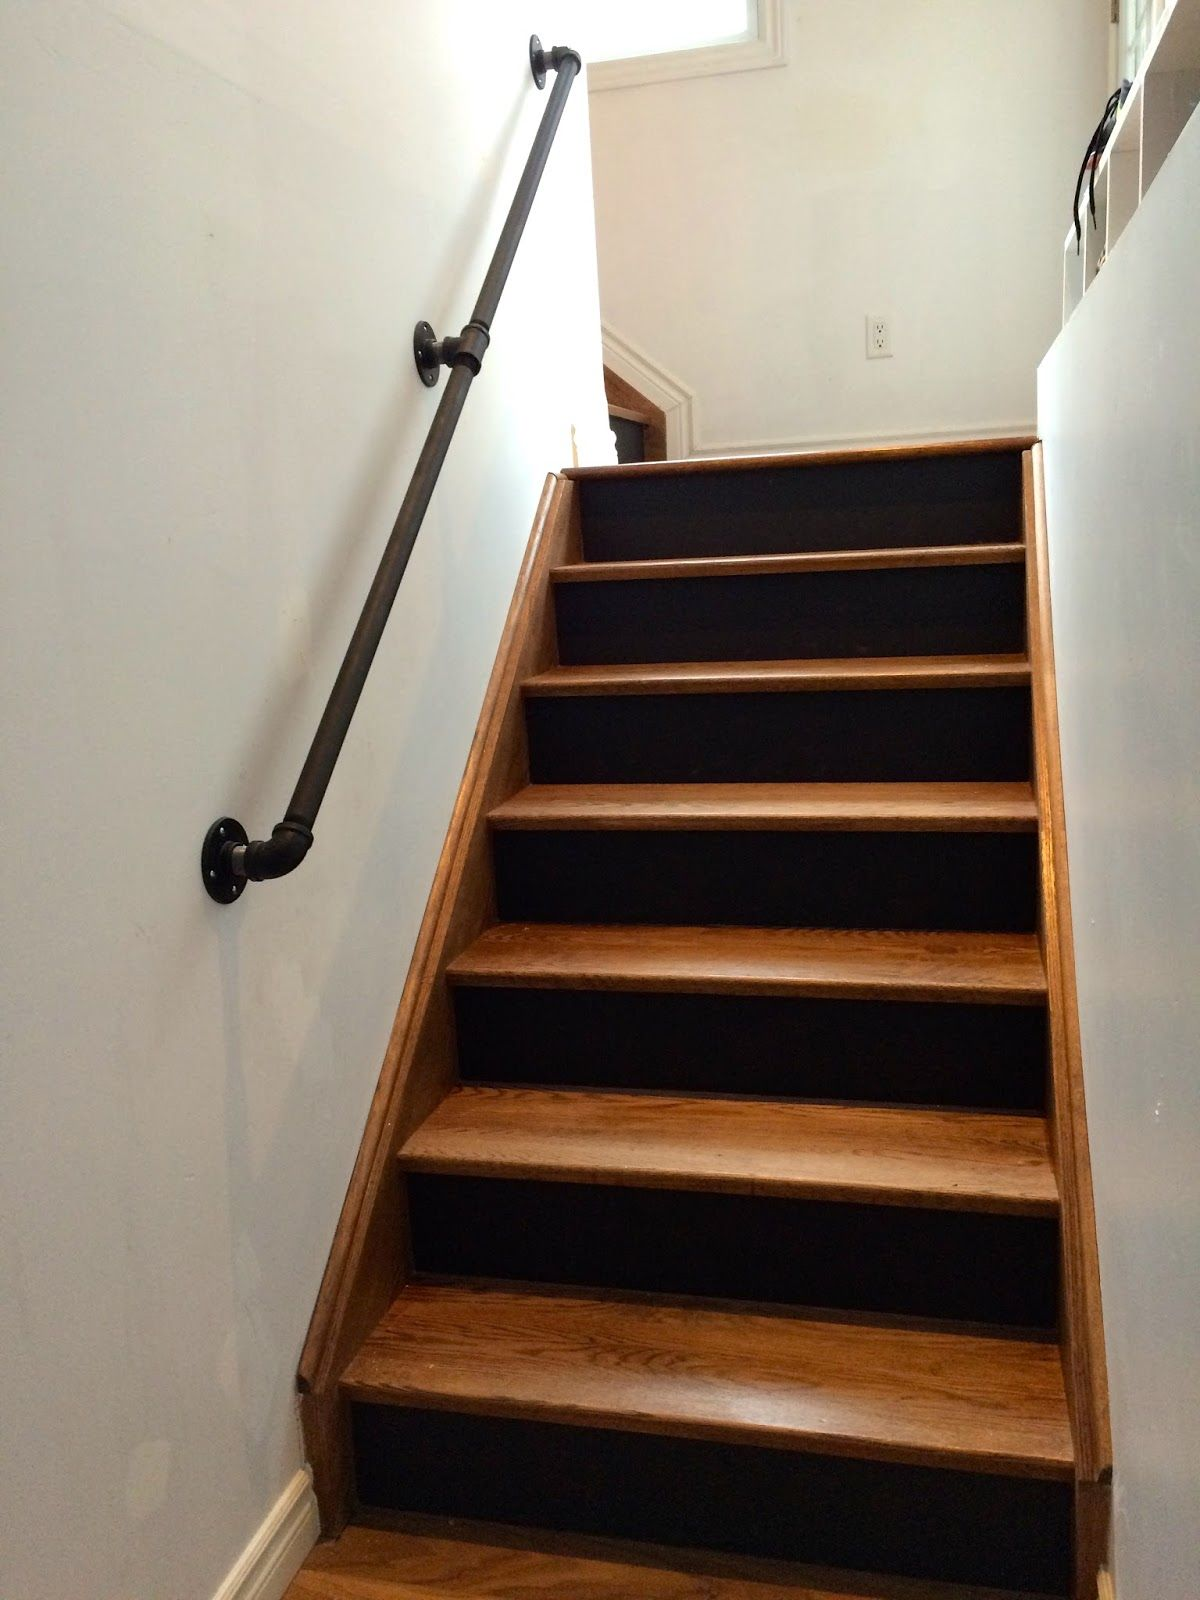 gas pipe railing, walnut stairs, black risers  | Stairs ...